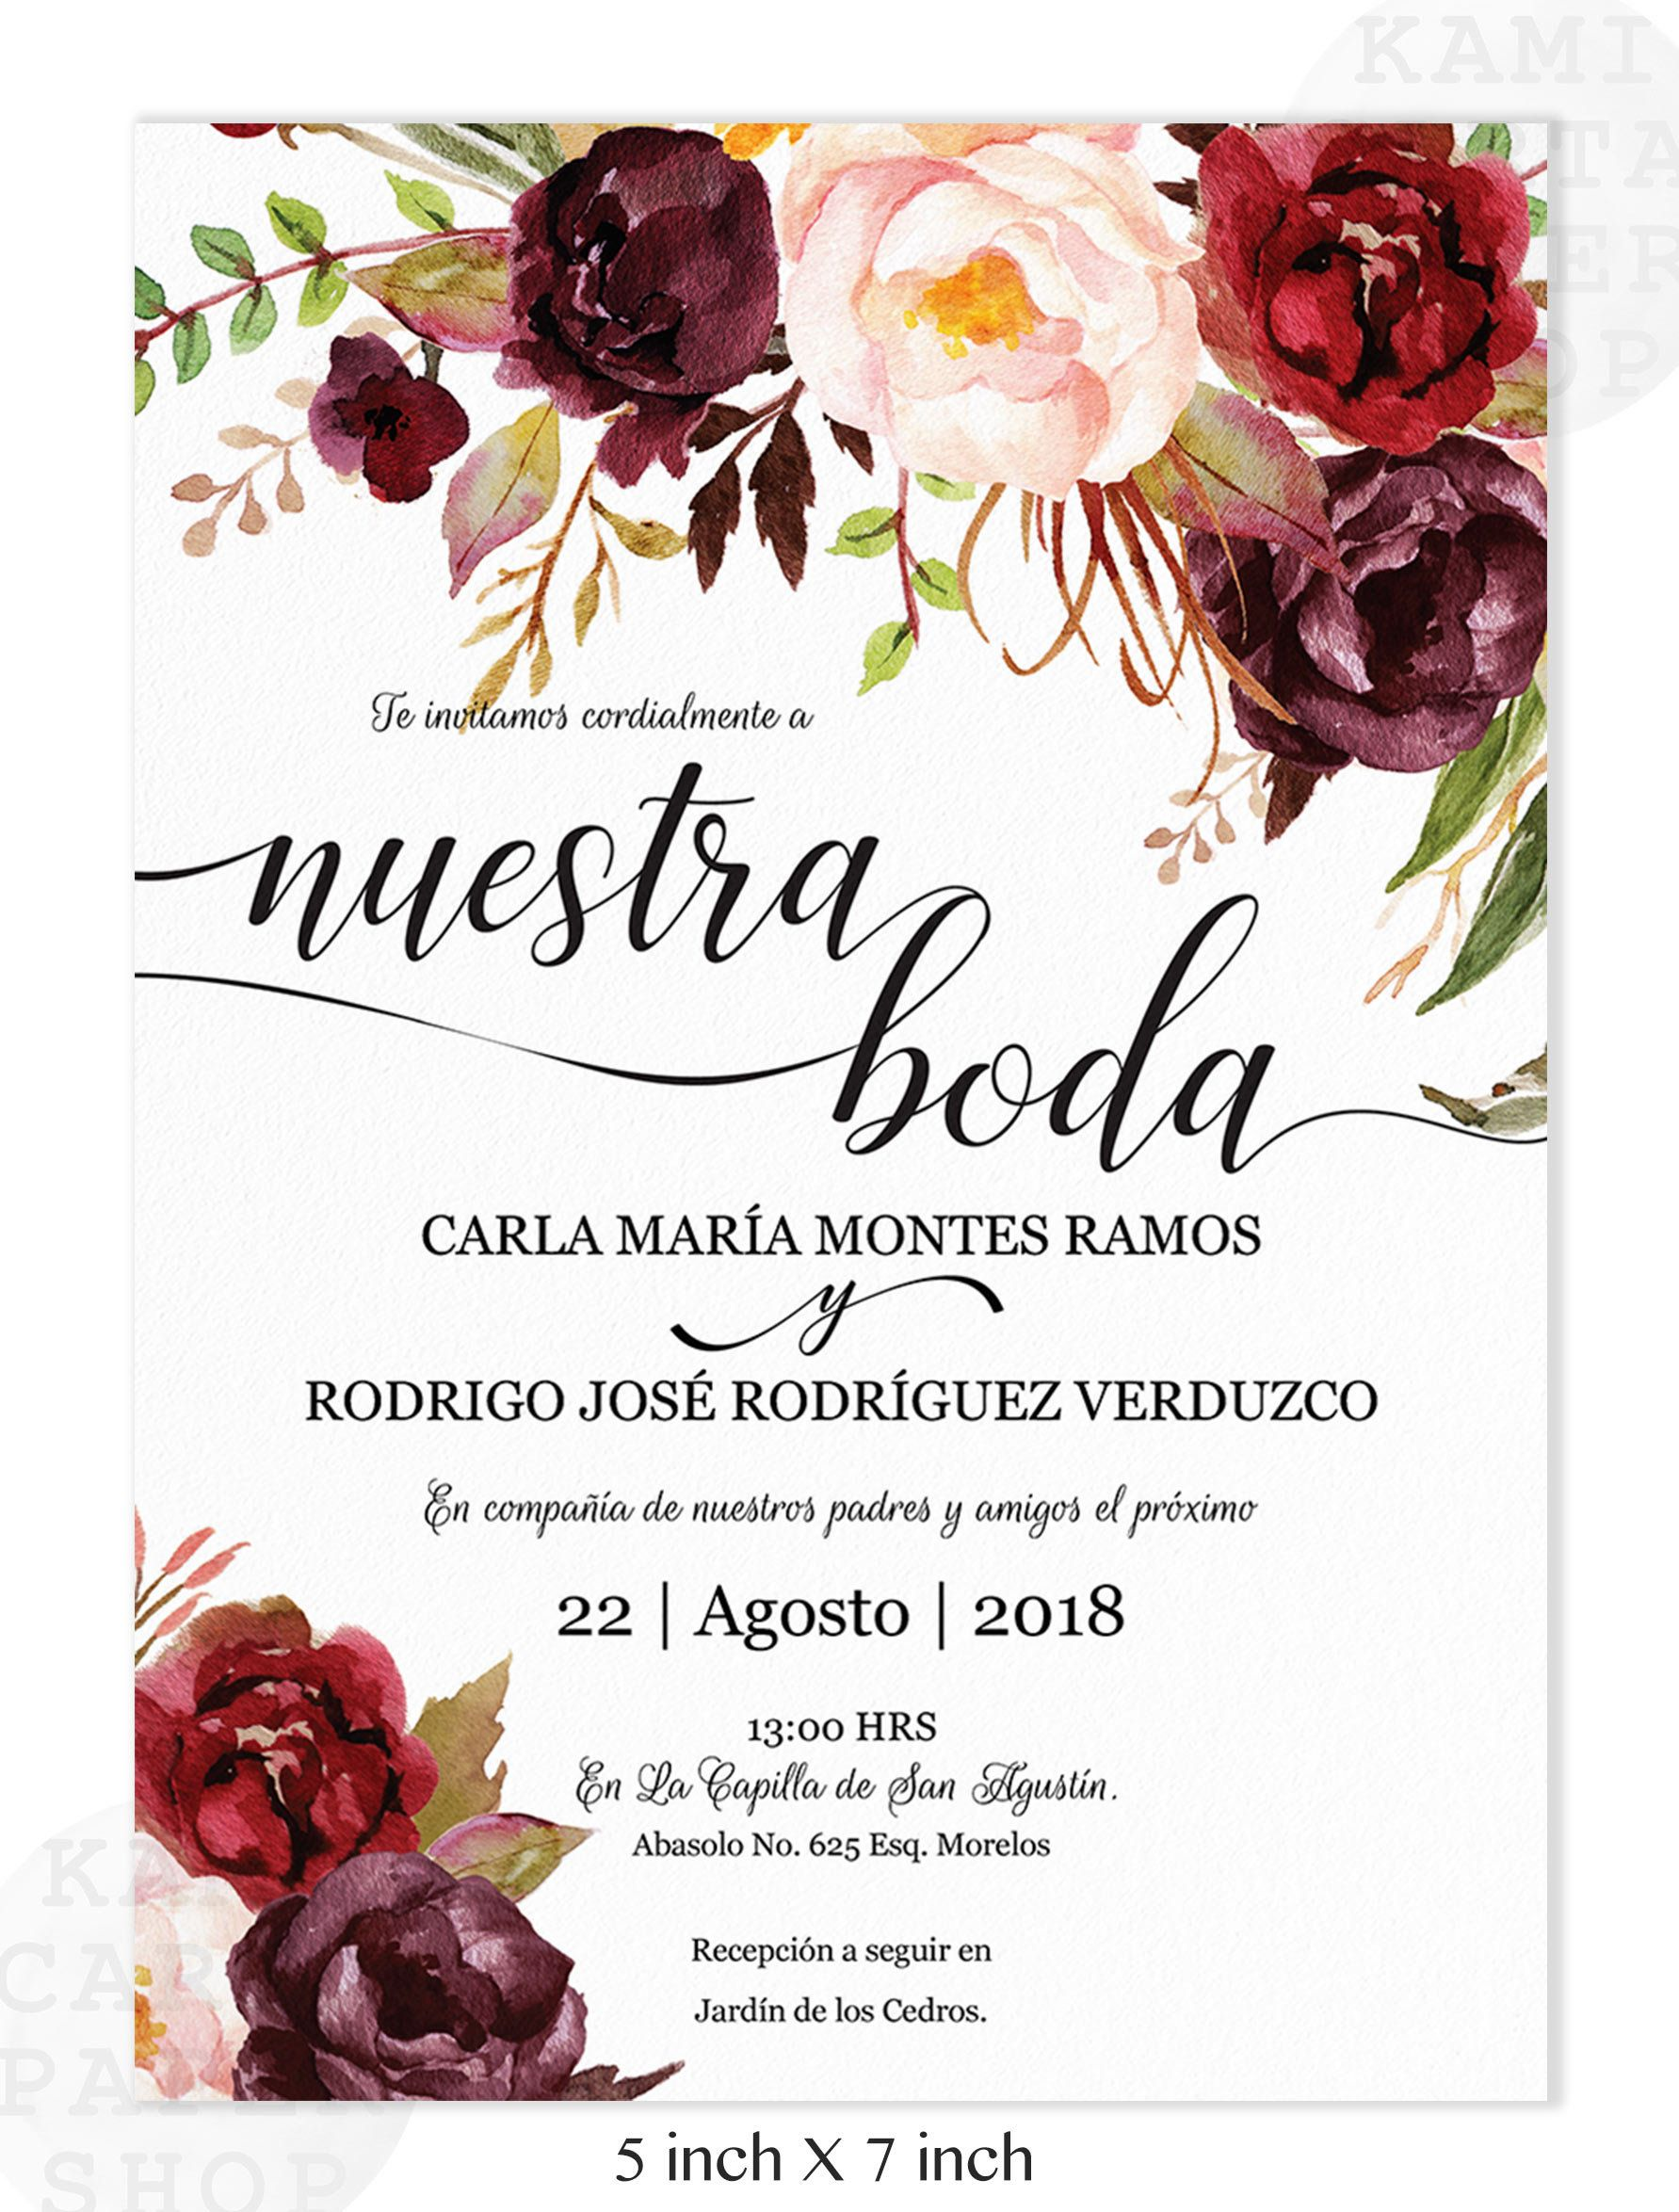 Invitaciones de Boda, Spanish wedding invitation,